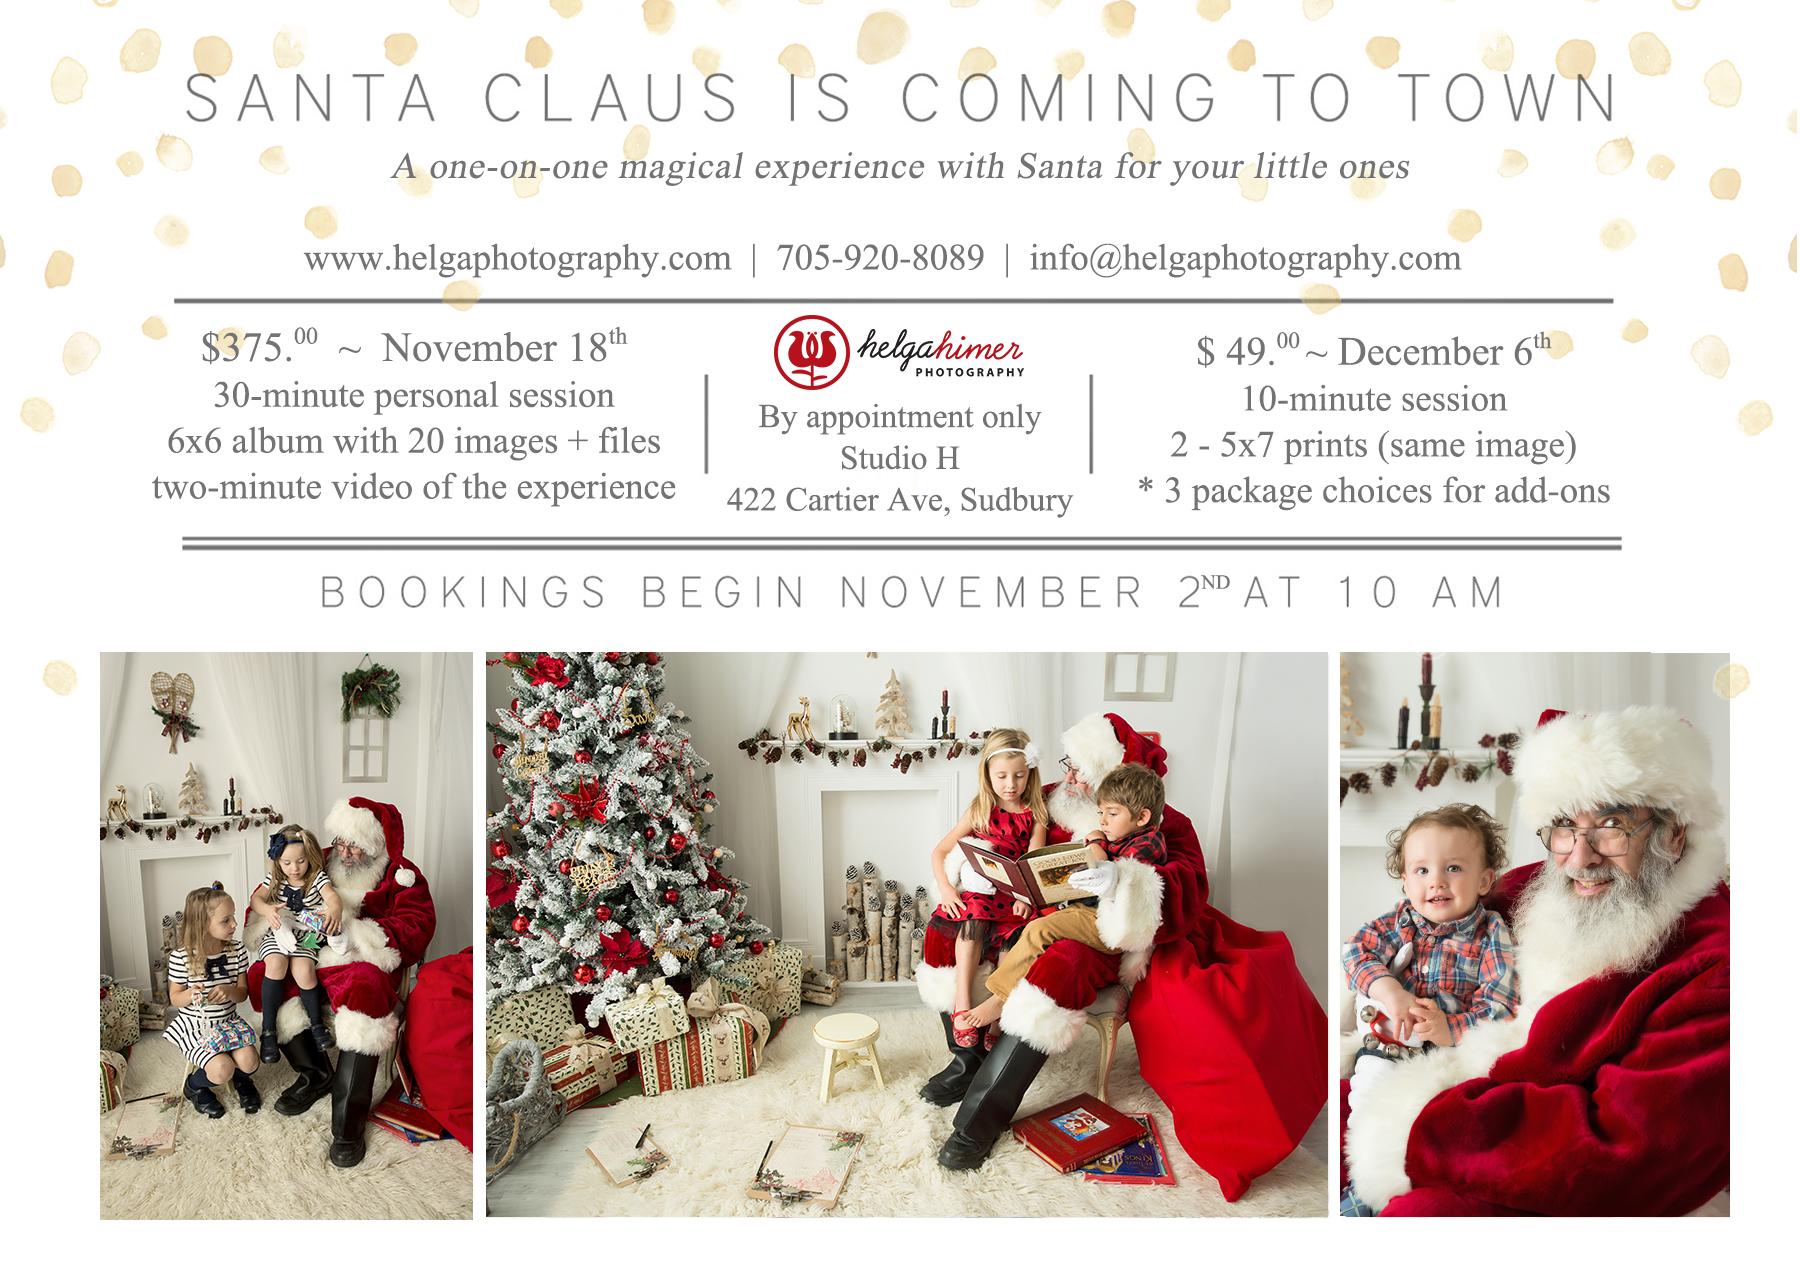 Santa Experience in the Sudbury photography studio. Winter setup for meeting Santa claus